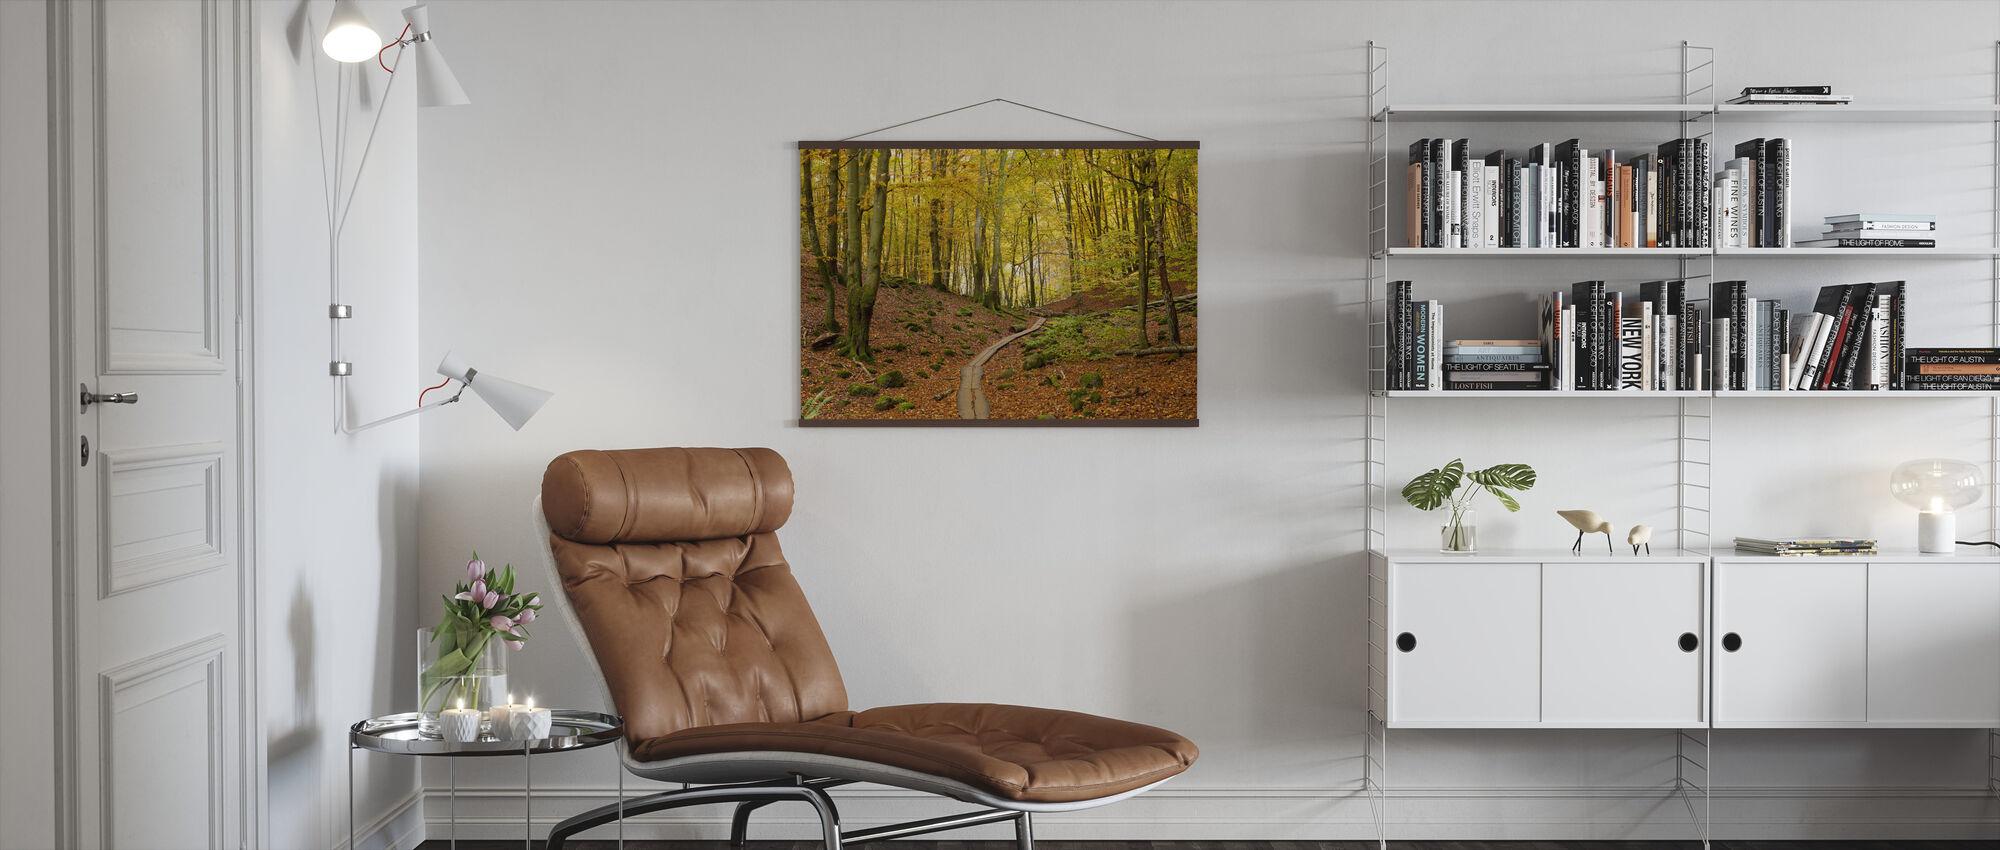 Soderasen Beech Wood, Sweden, Europe - Poster - Living Room